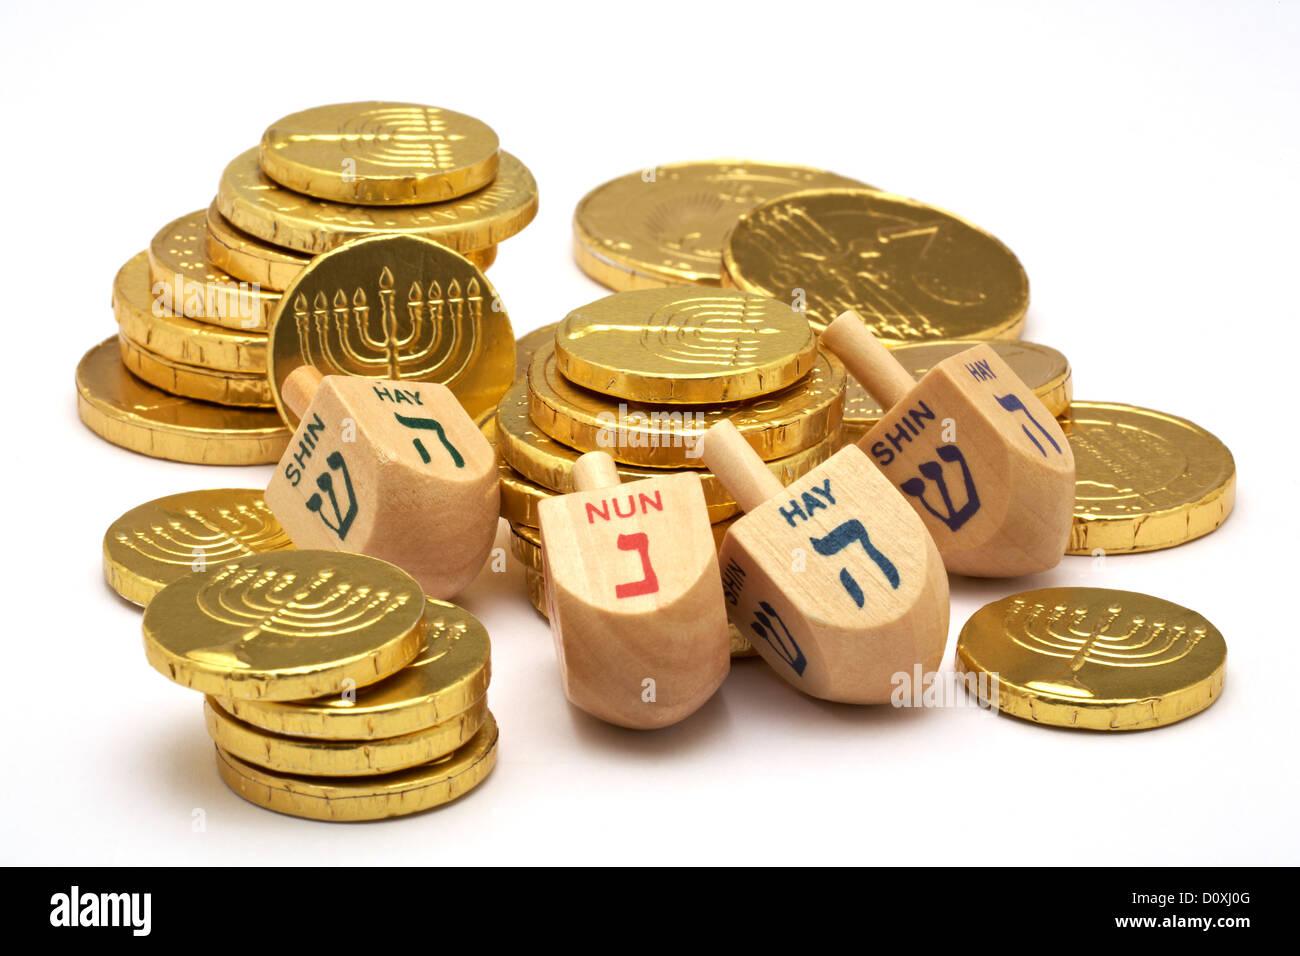 Chocolate Gold Coins with Jewish Menorah embossed Hanukkah Gelt ...